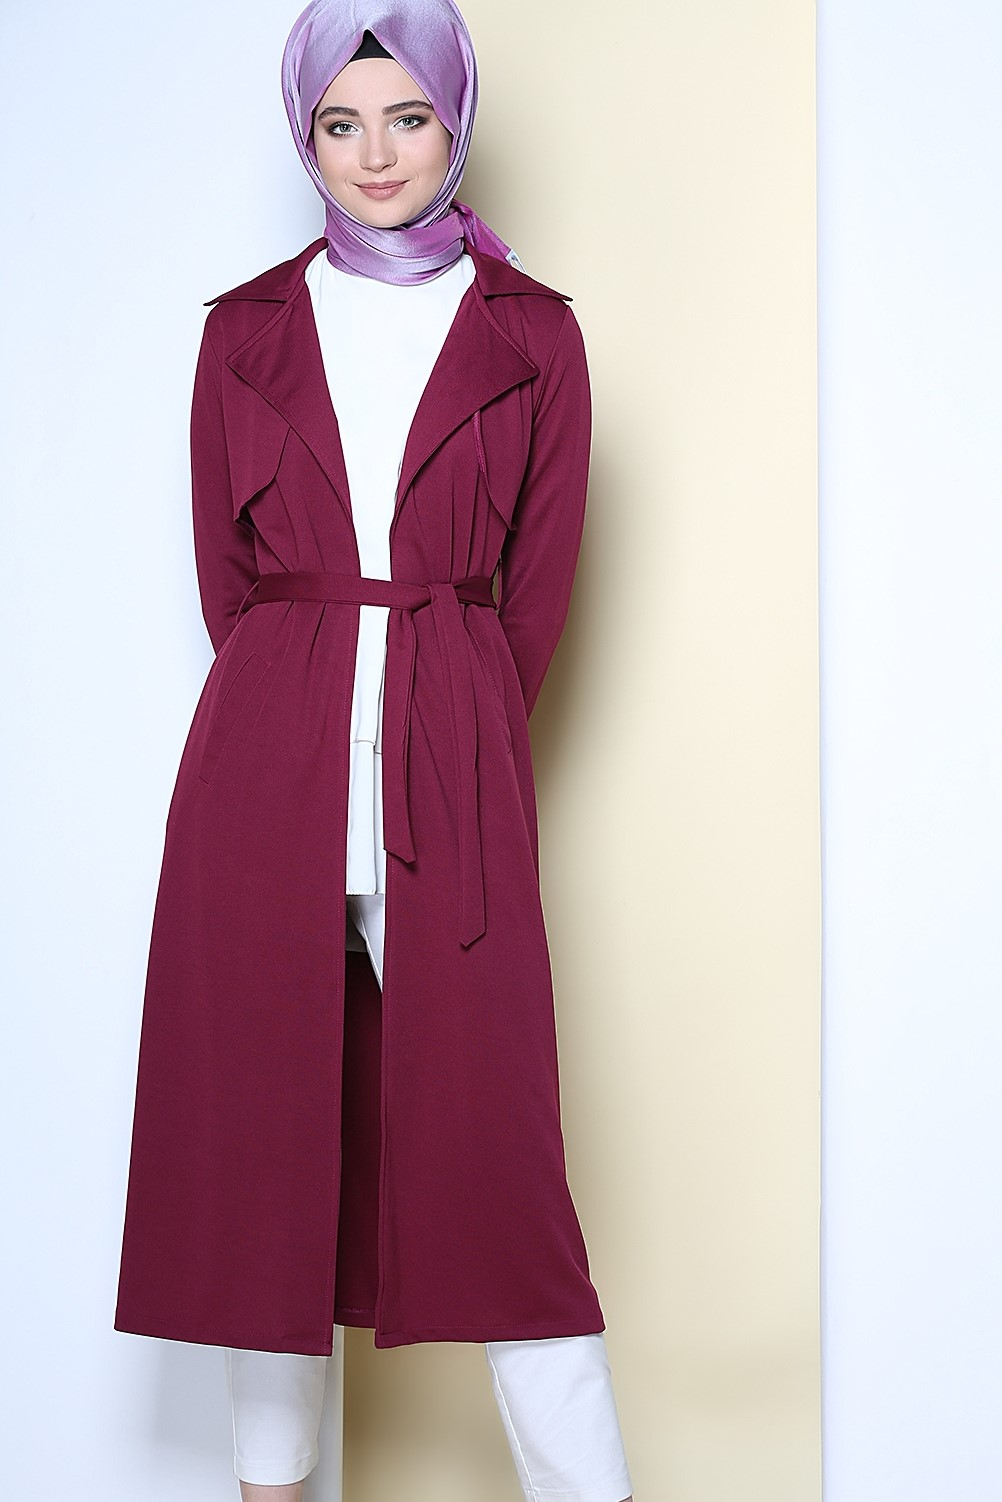 hijab,hiver,style,2018